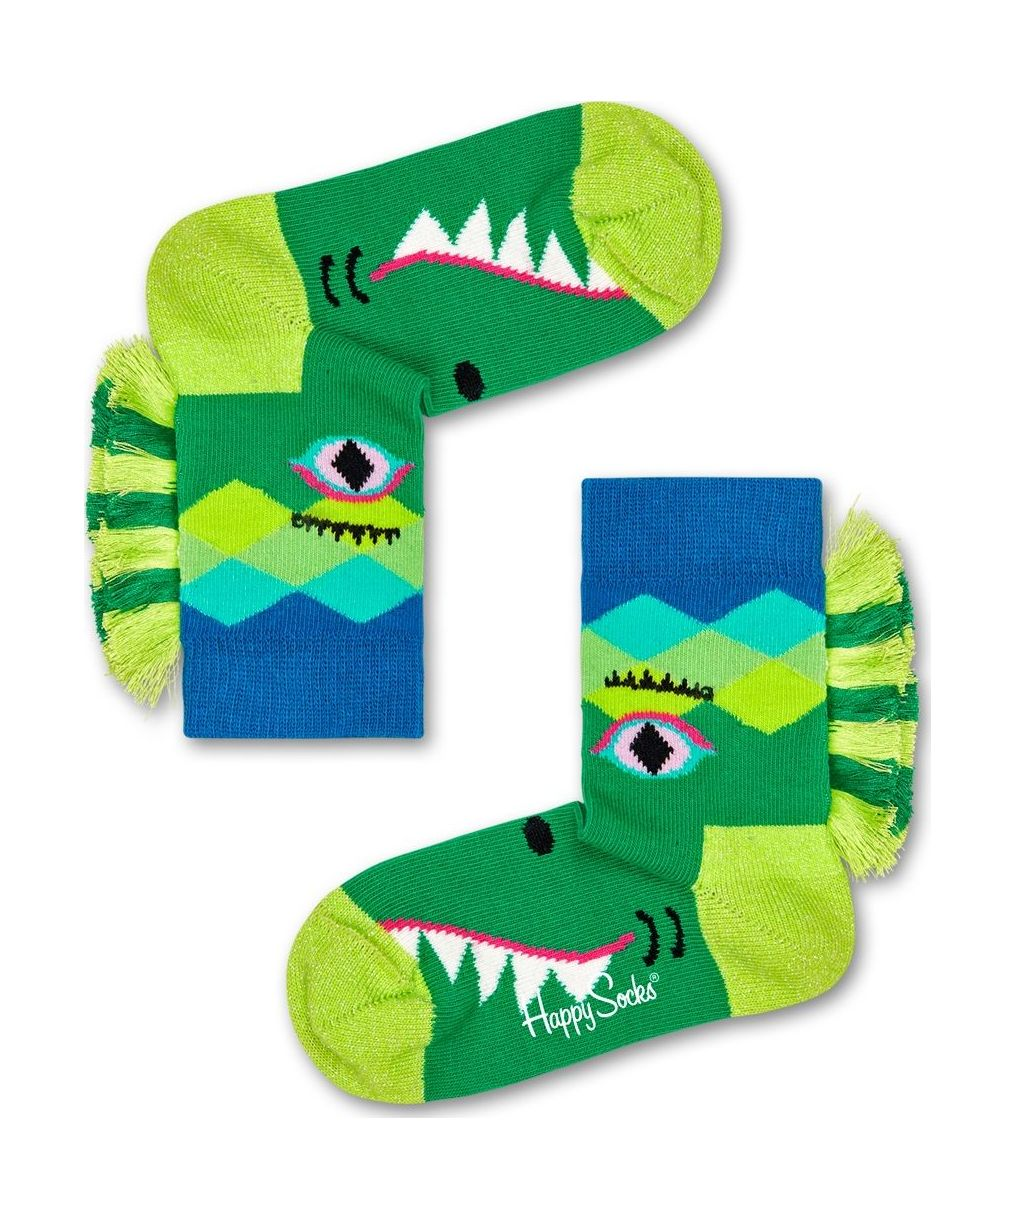 Happy Socks Crazy Crocodile Multi 7300 22-24